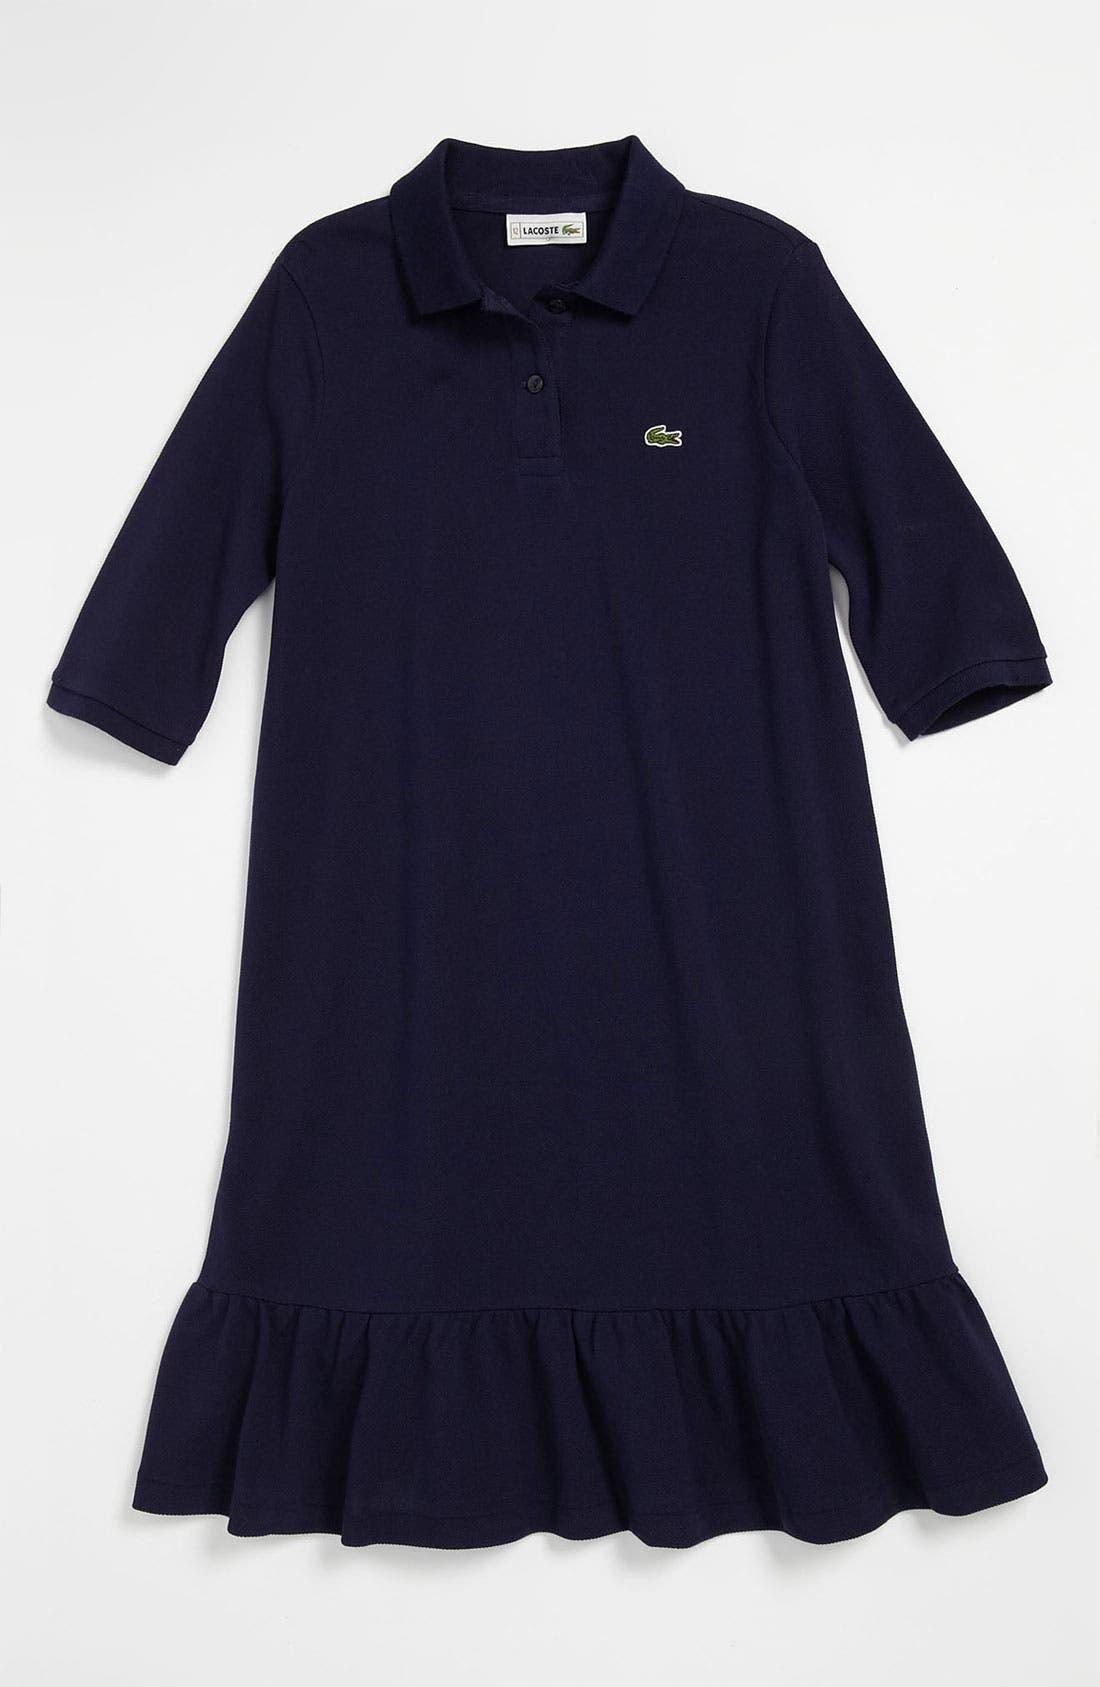 Alternate Image 1 Selected - Lacoste Ruffle Hem Polo Dress (Little Girls & Big Girls)